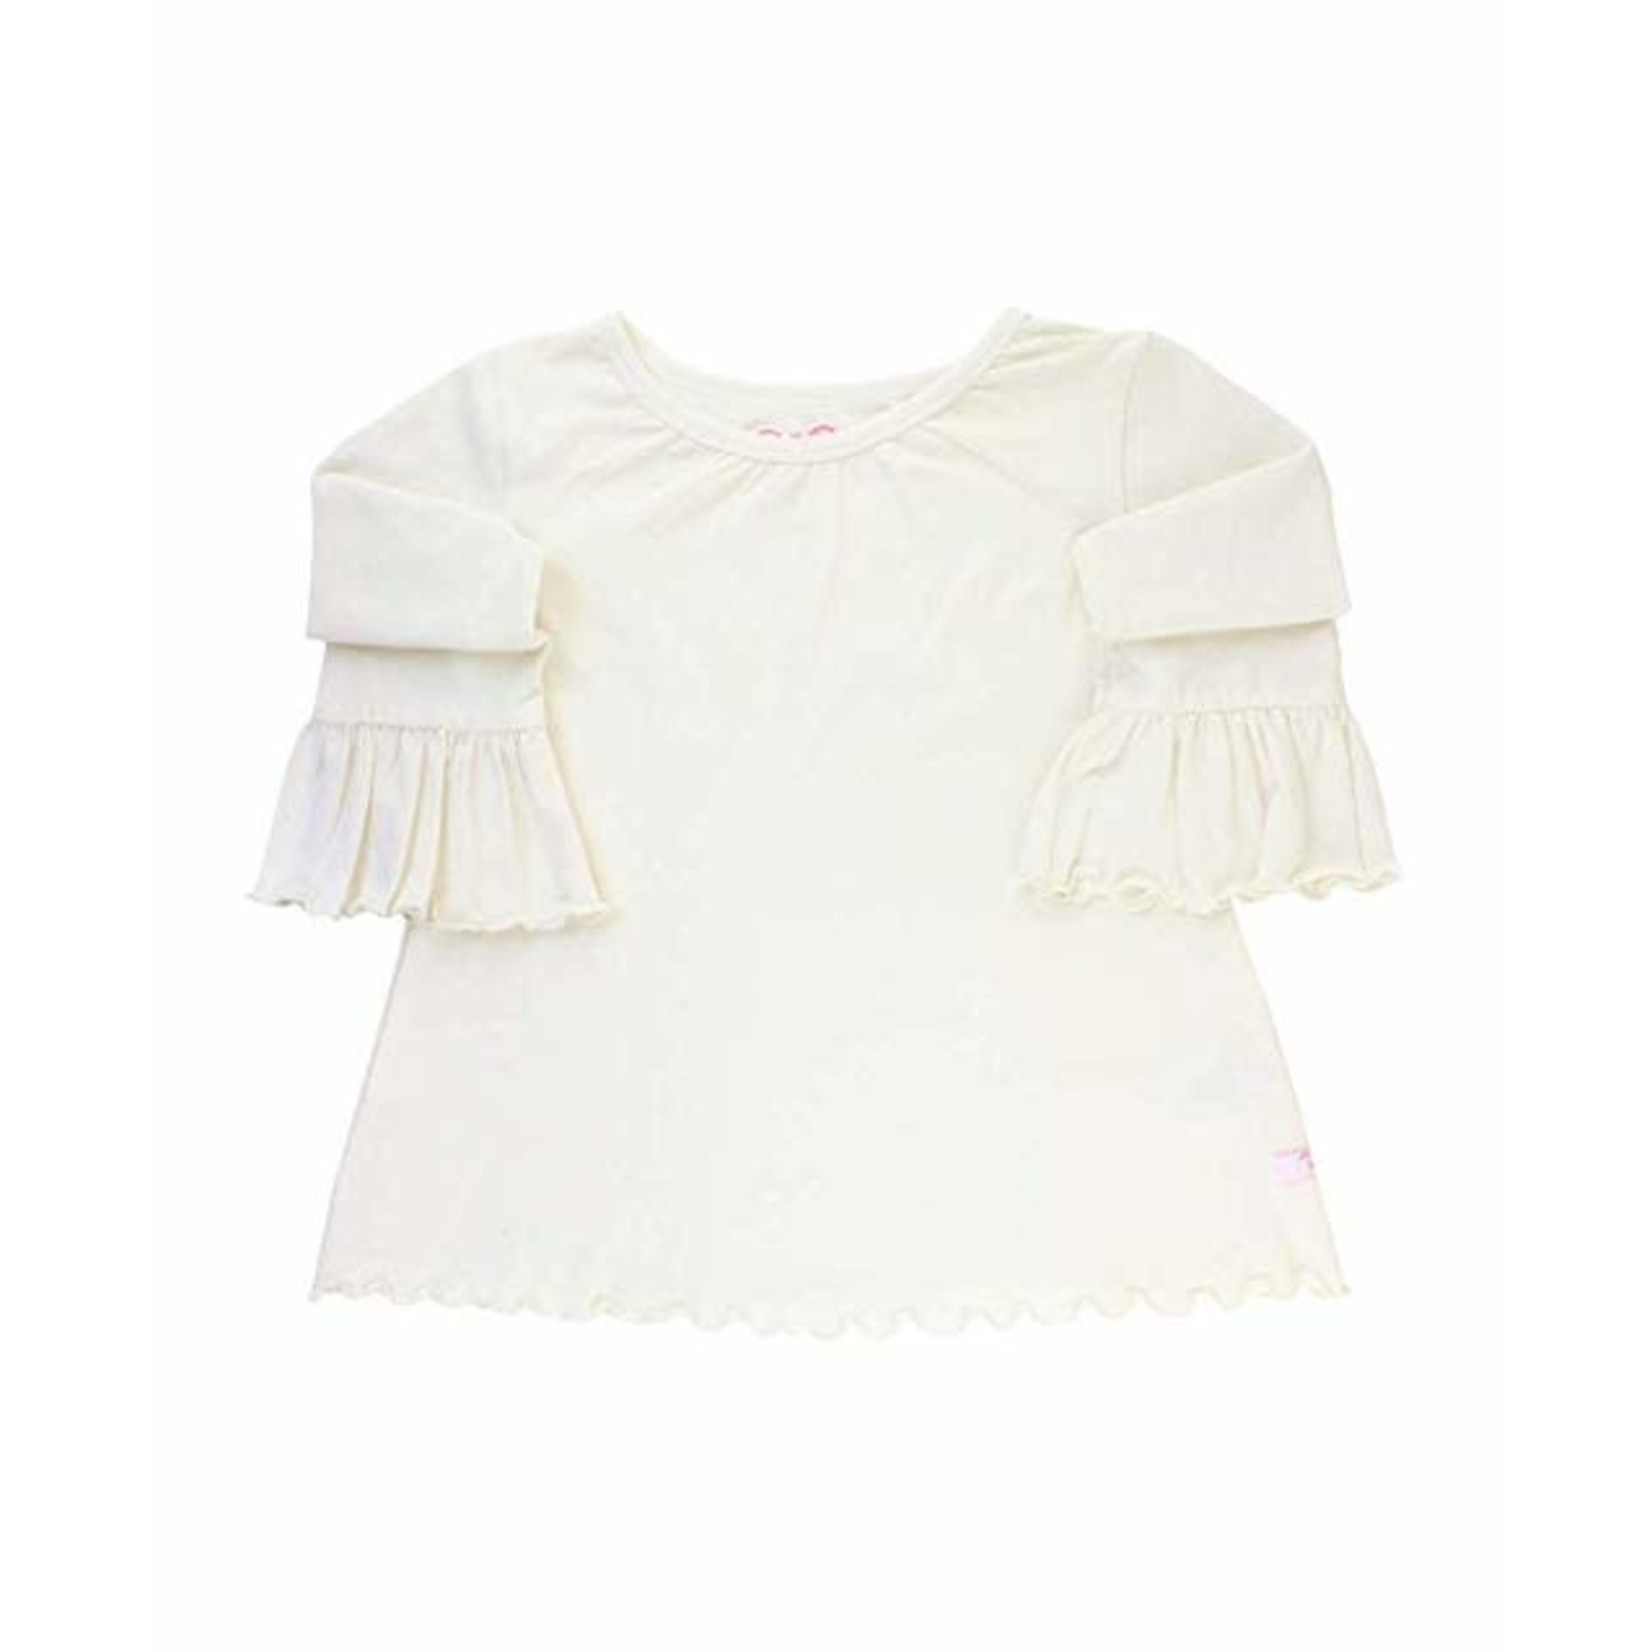 RuffleButts Baby/Girls Knit Belle Top, Ivory